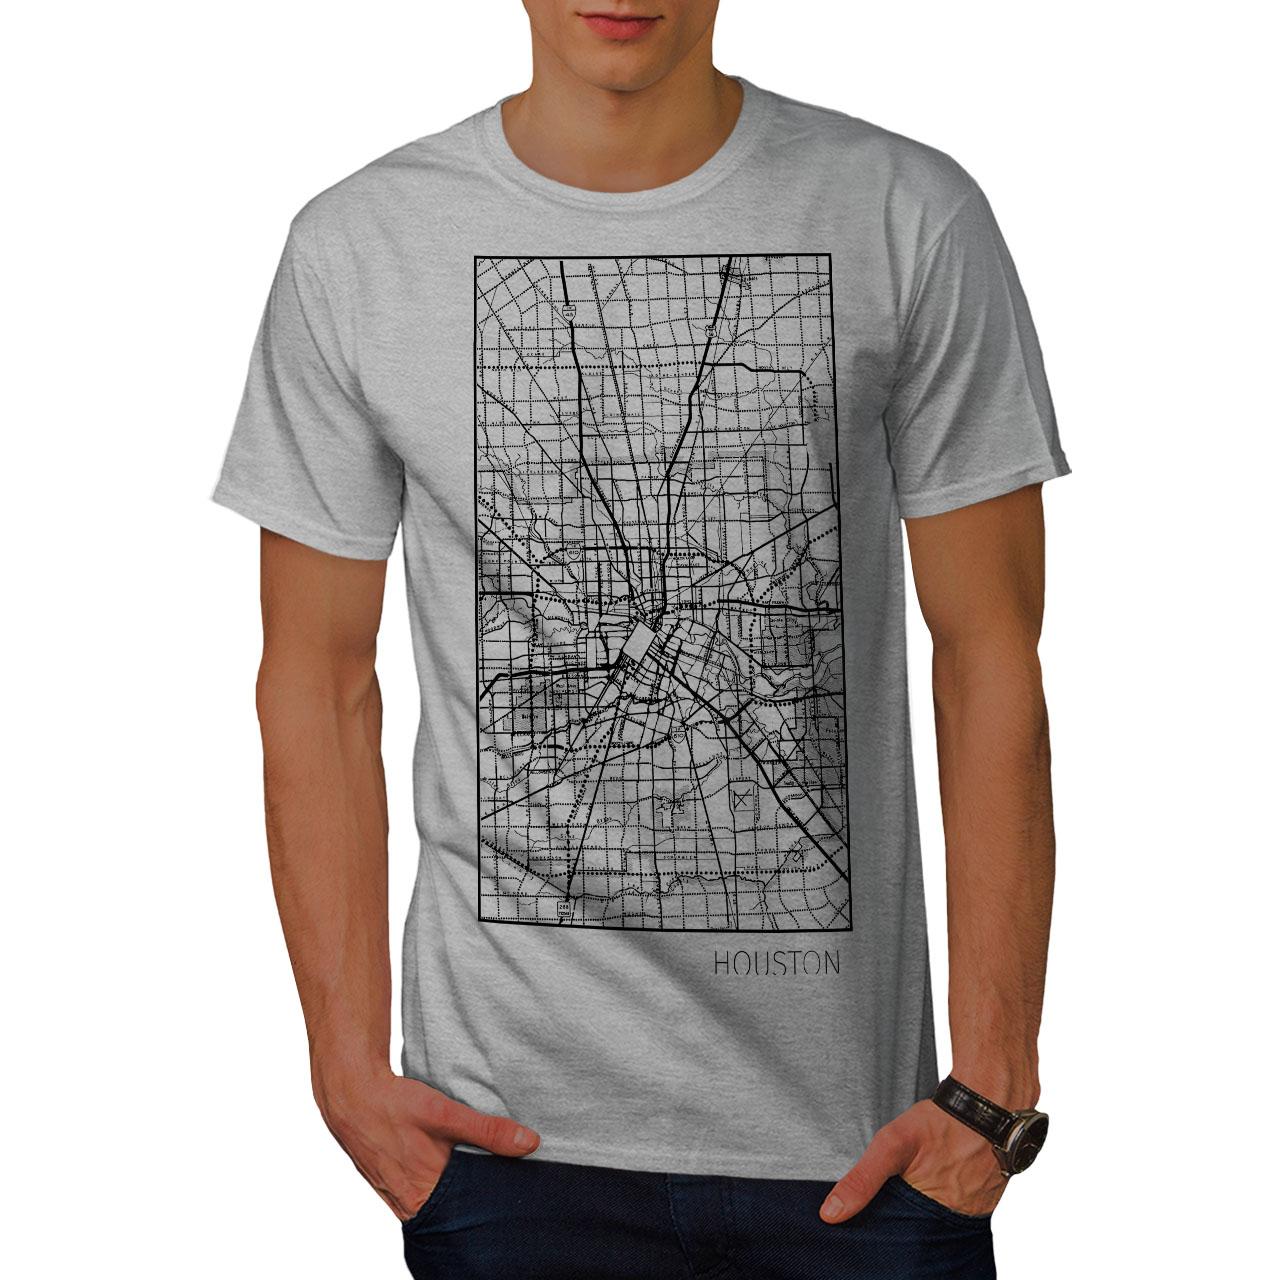 000178c98107 Image is loading Wellcoda-Houston-City-Map-Fashion-Mens-T-shirt-